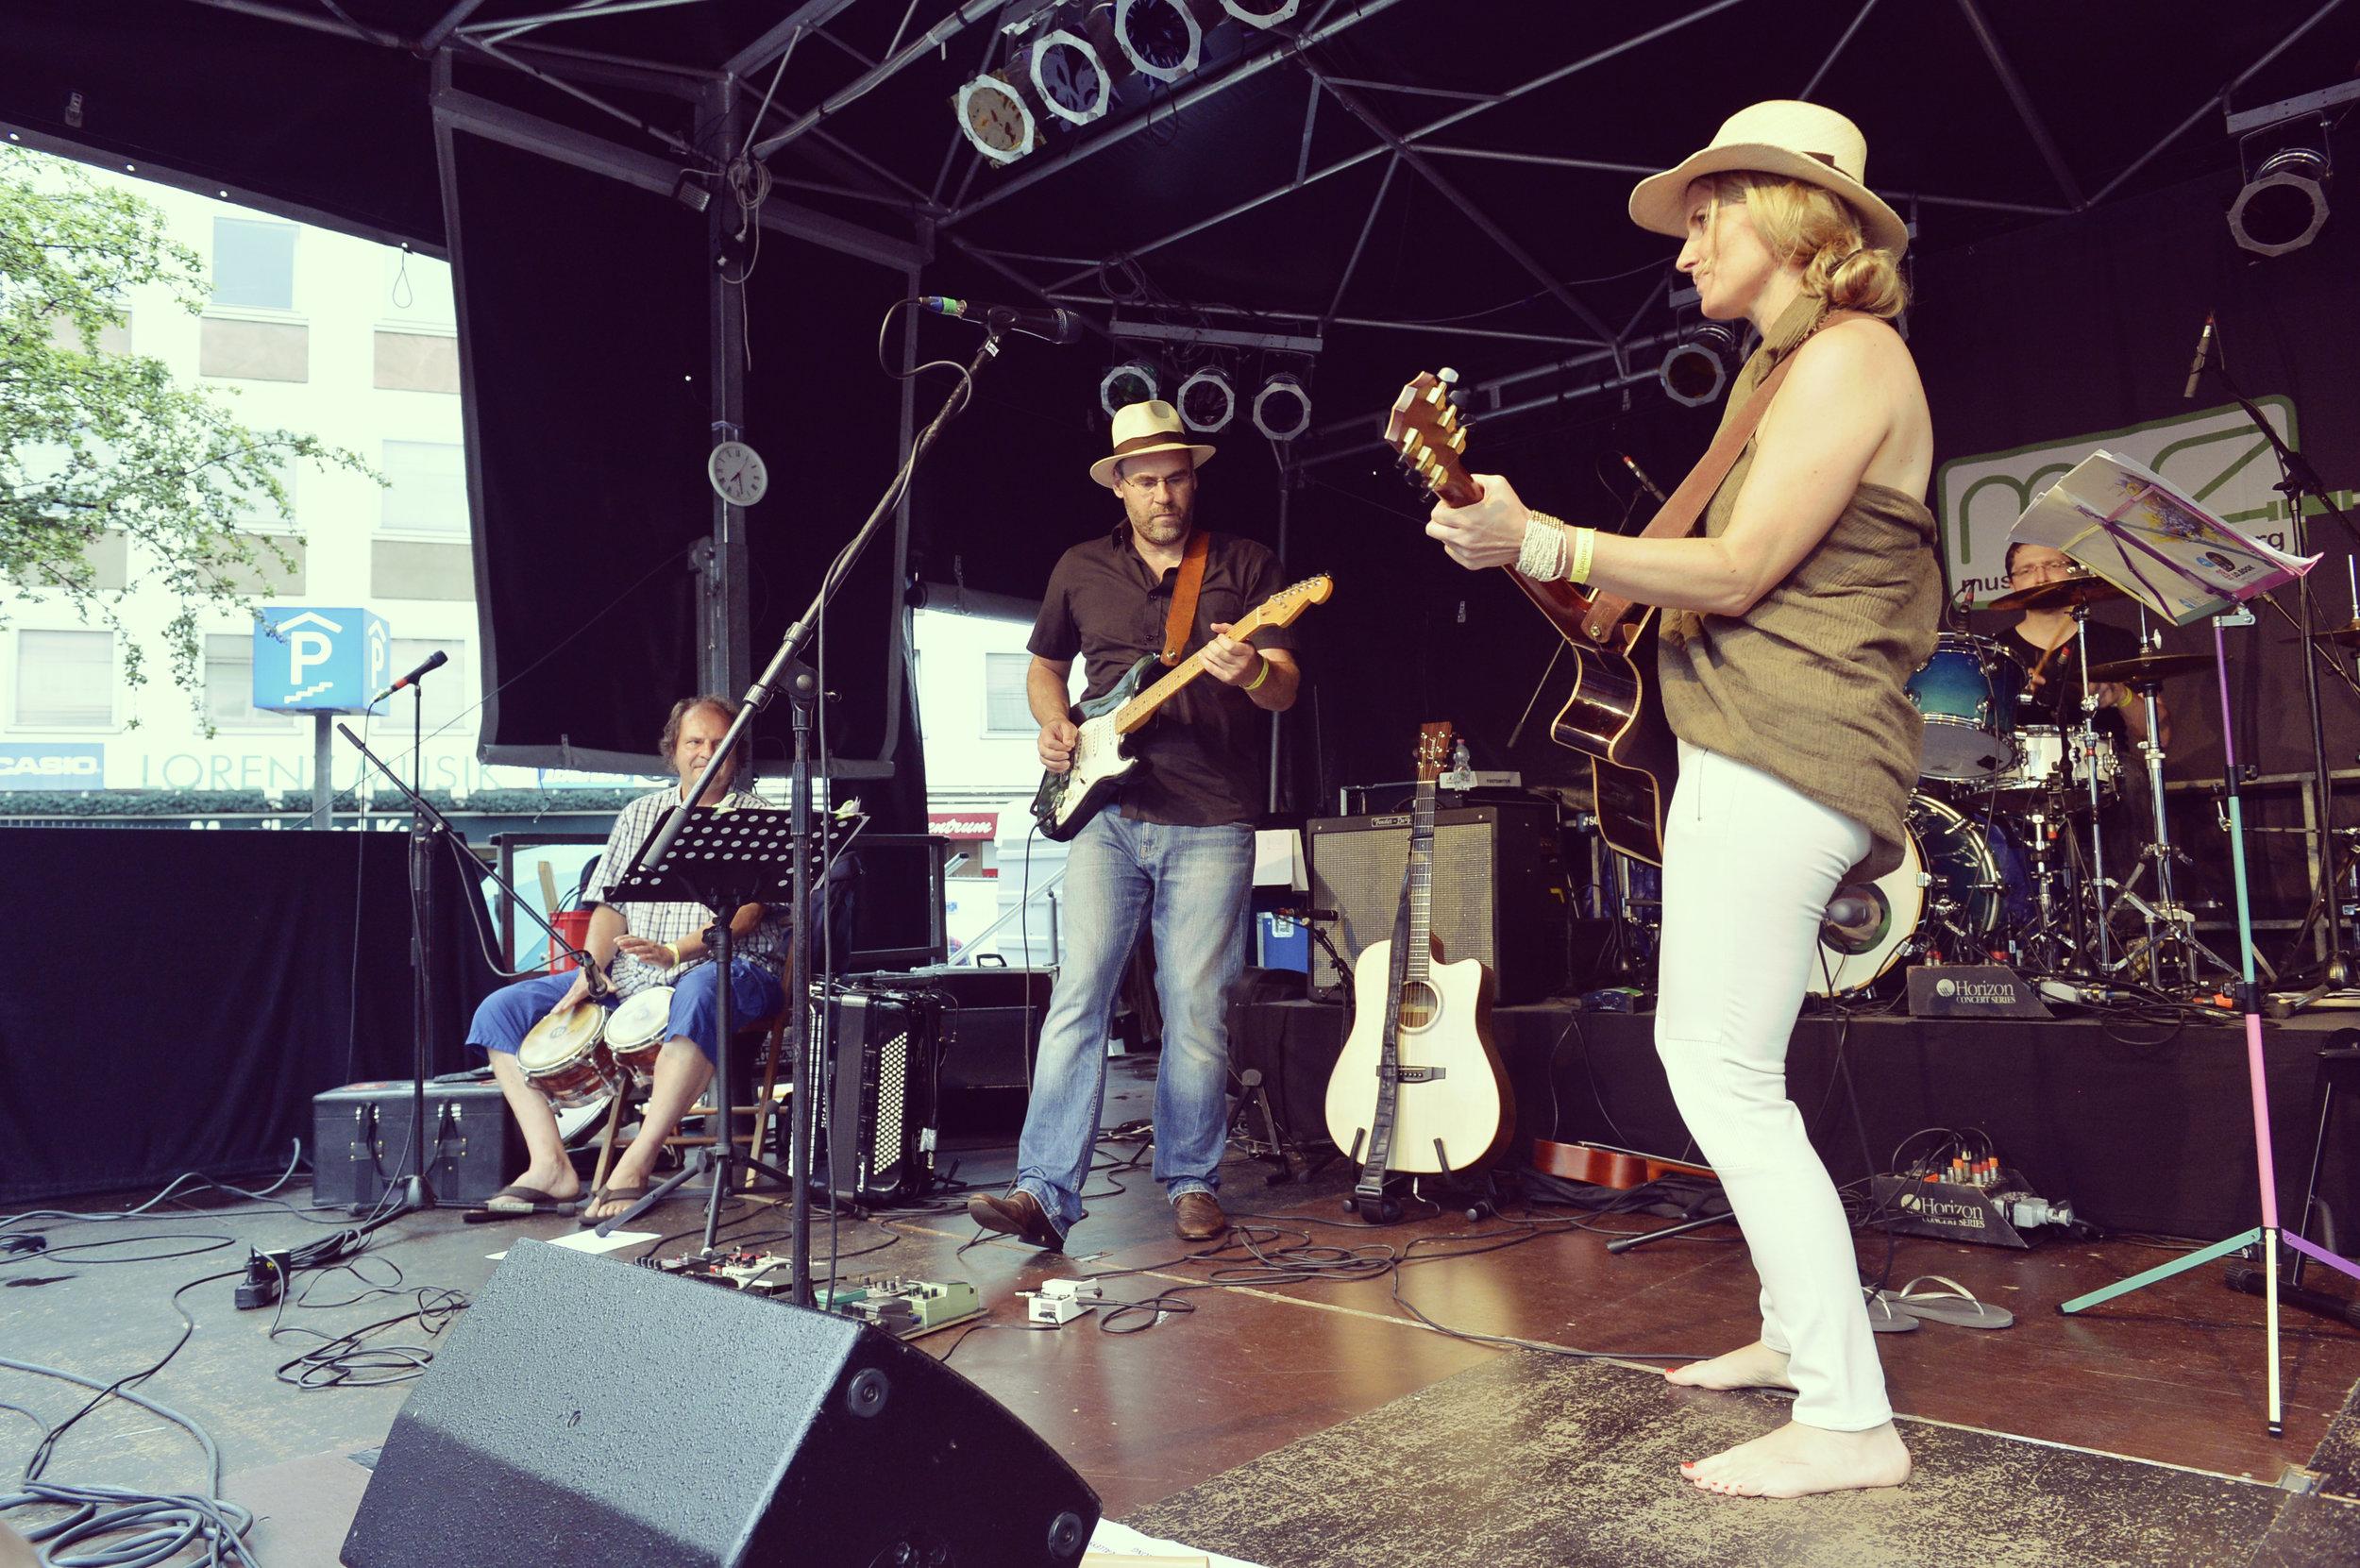 Samantha Stollenwerck and band playing Nuremberg, Germany, Bardentreffen Festival.